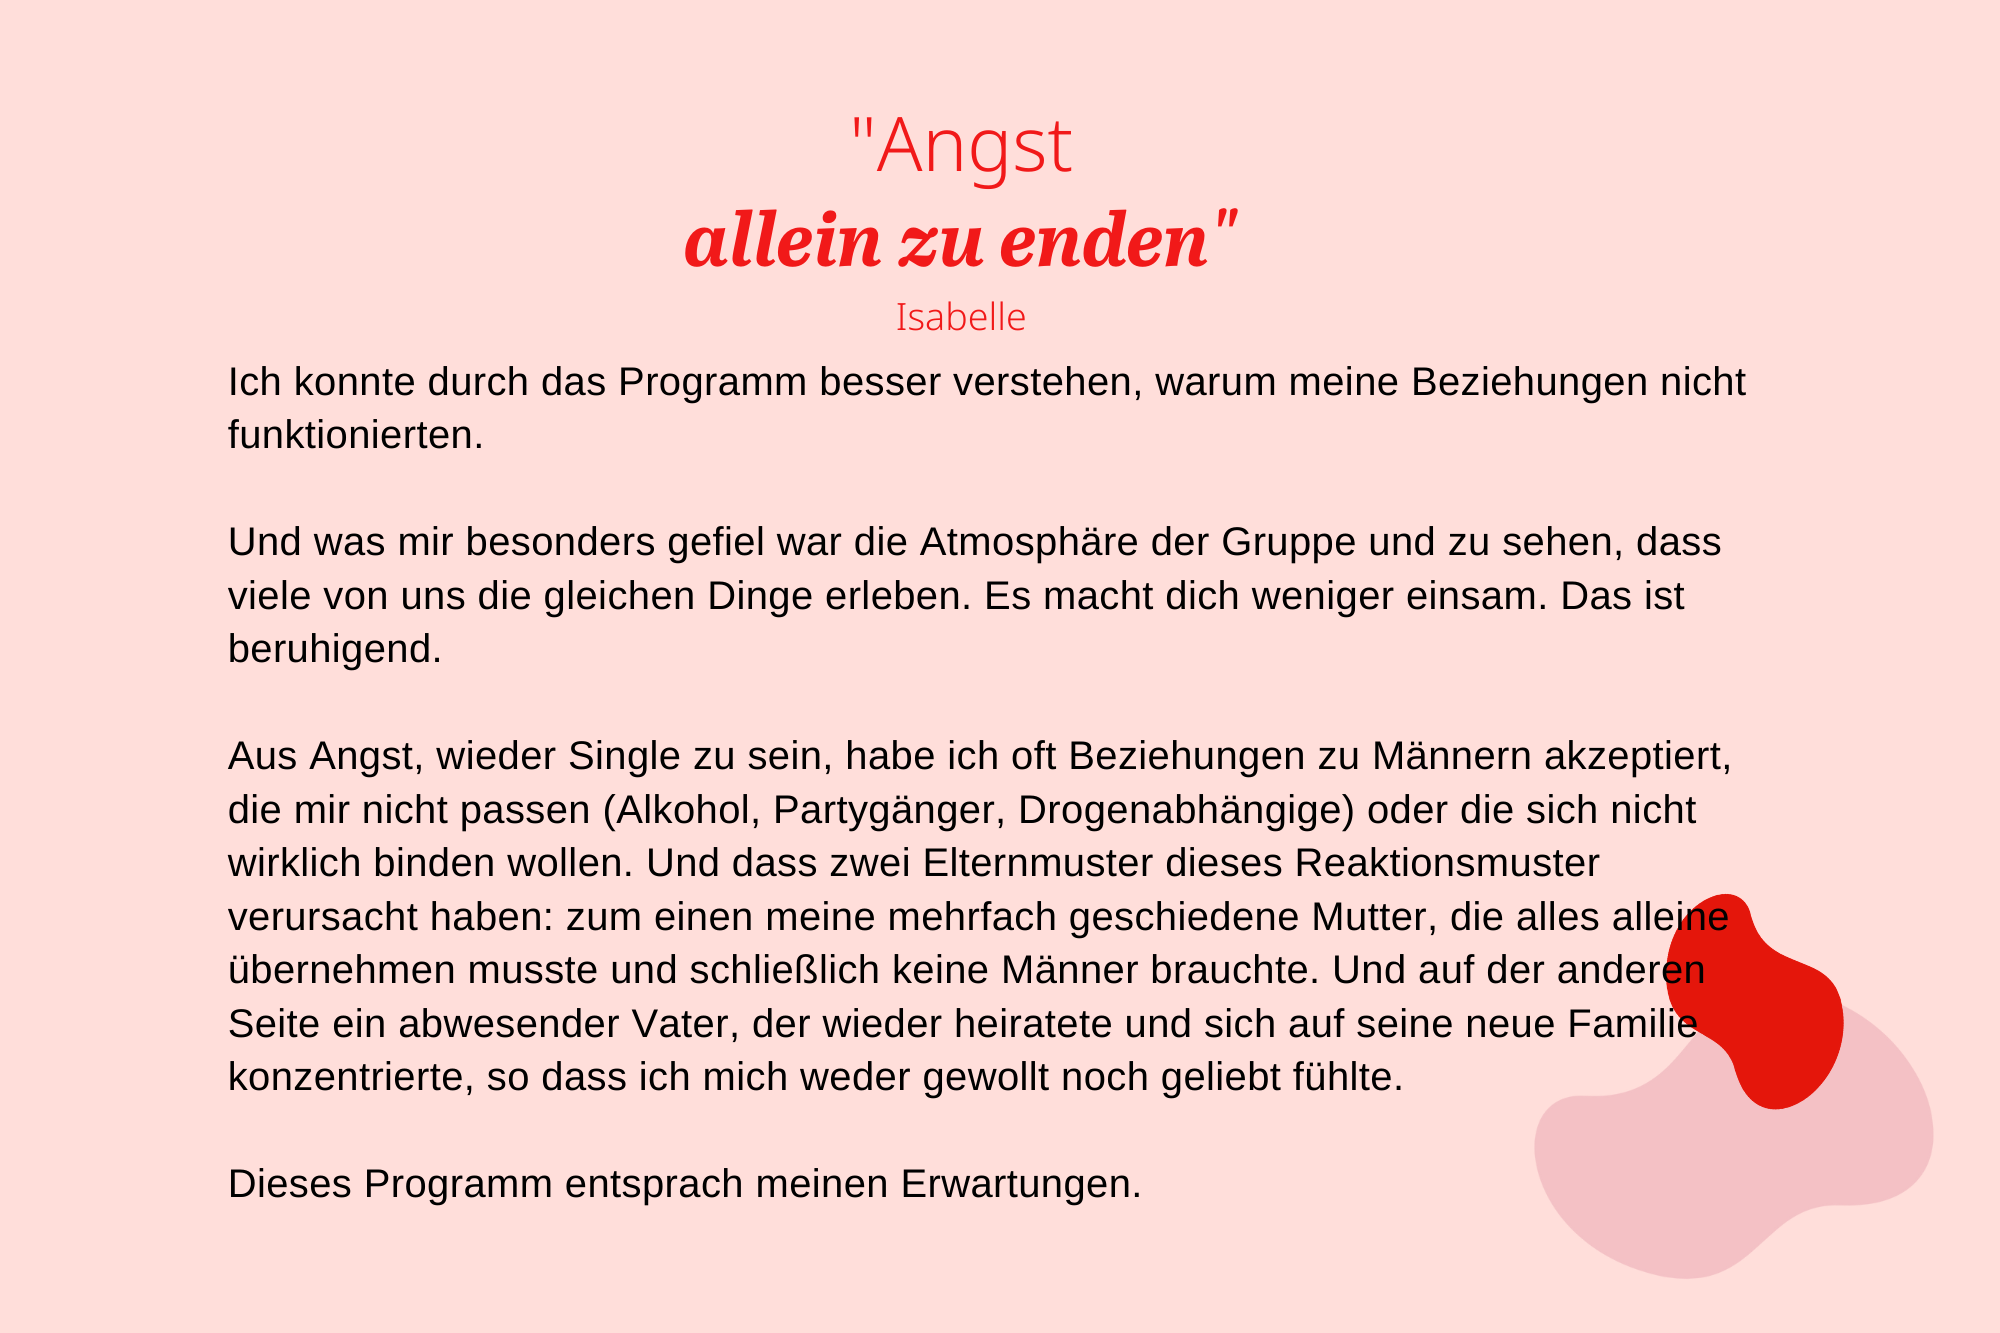 DE_Erfahrungsberichte_Liebescoach_Angst allein zu enden